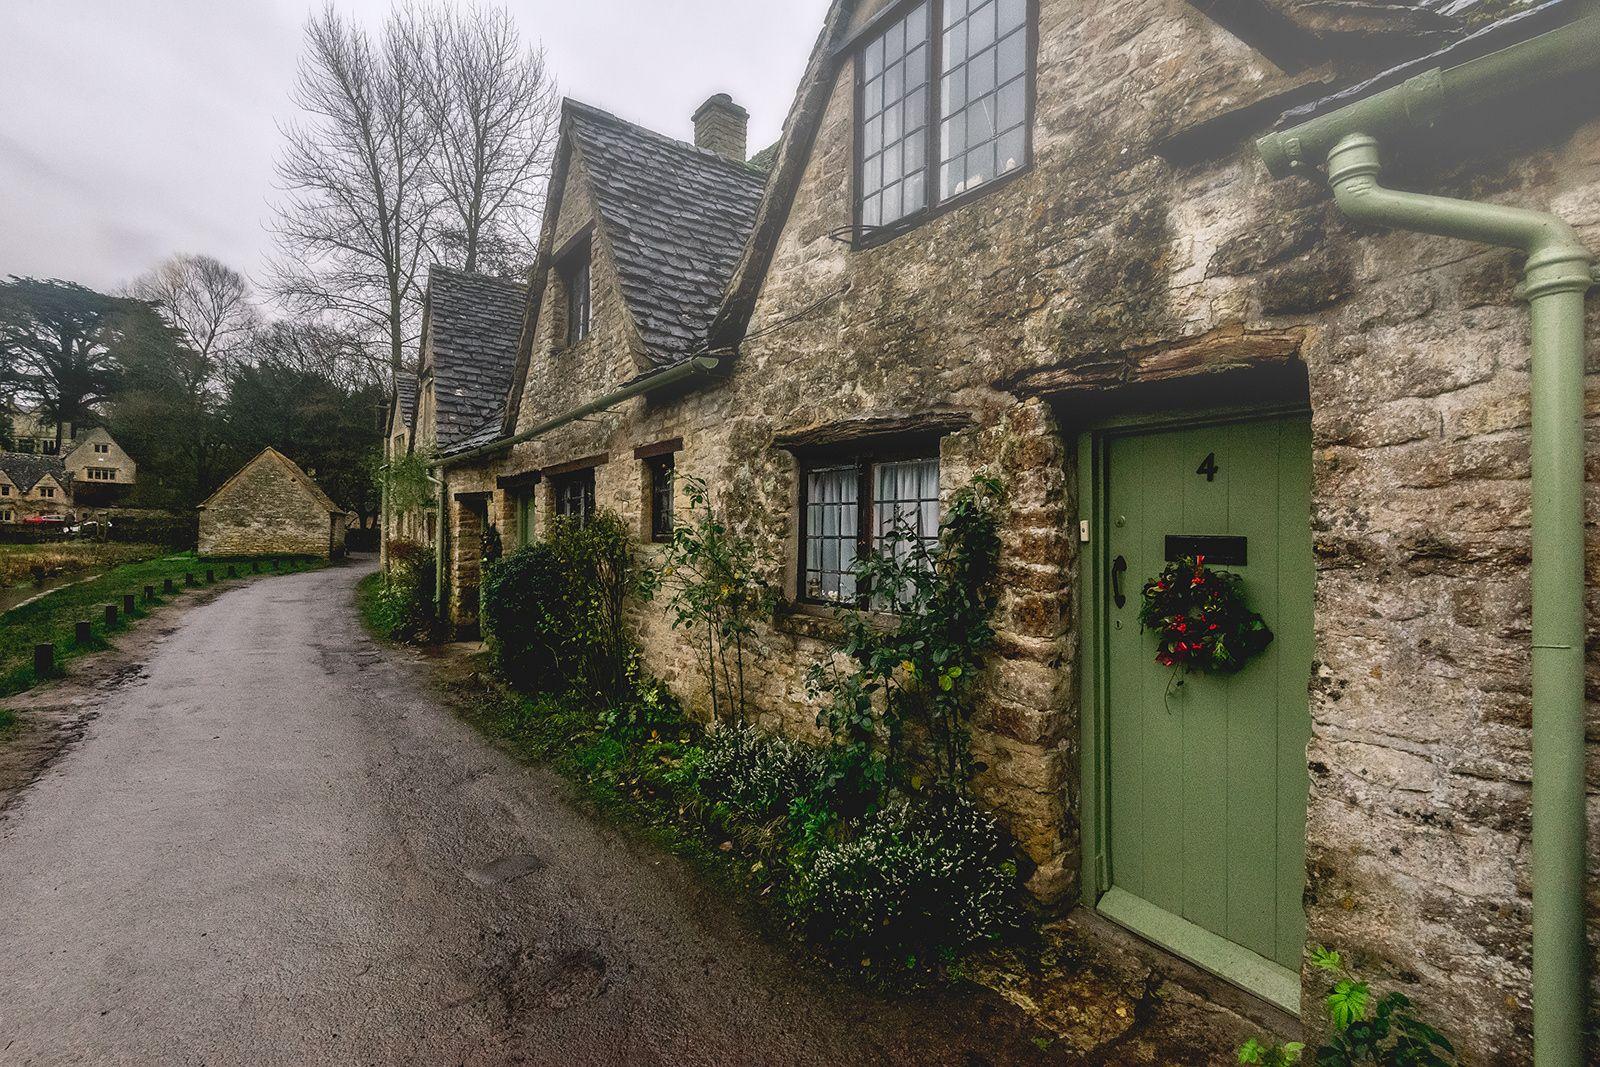 Sone Cottages Bibury by Helminadia Ranford on 500px